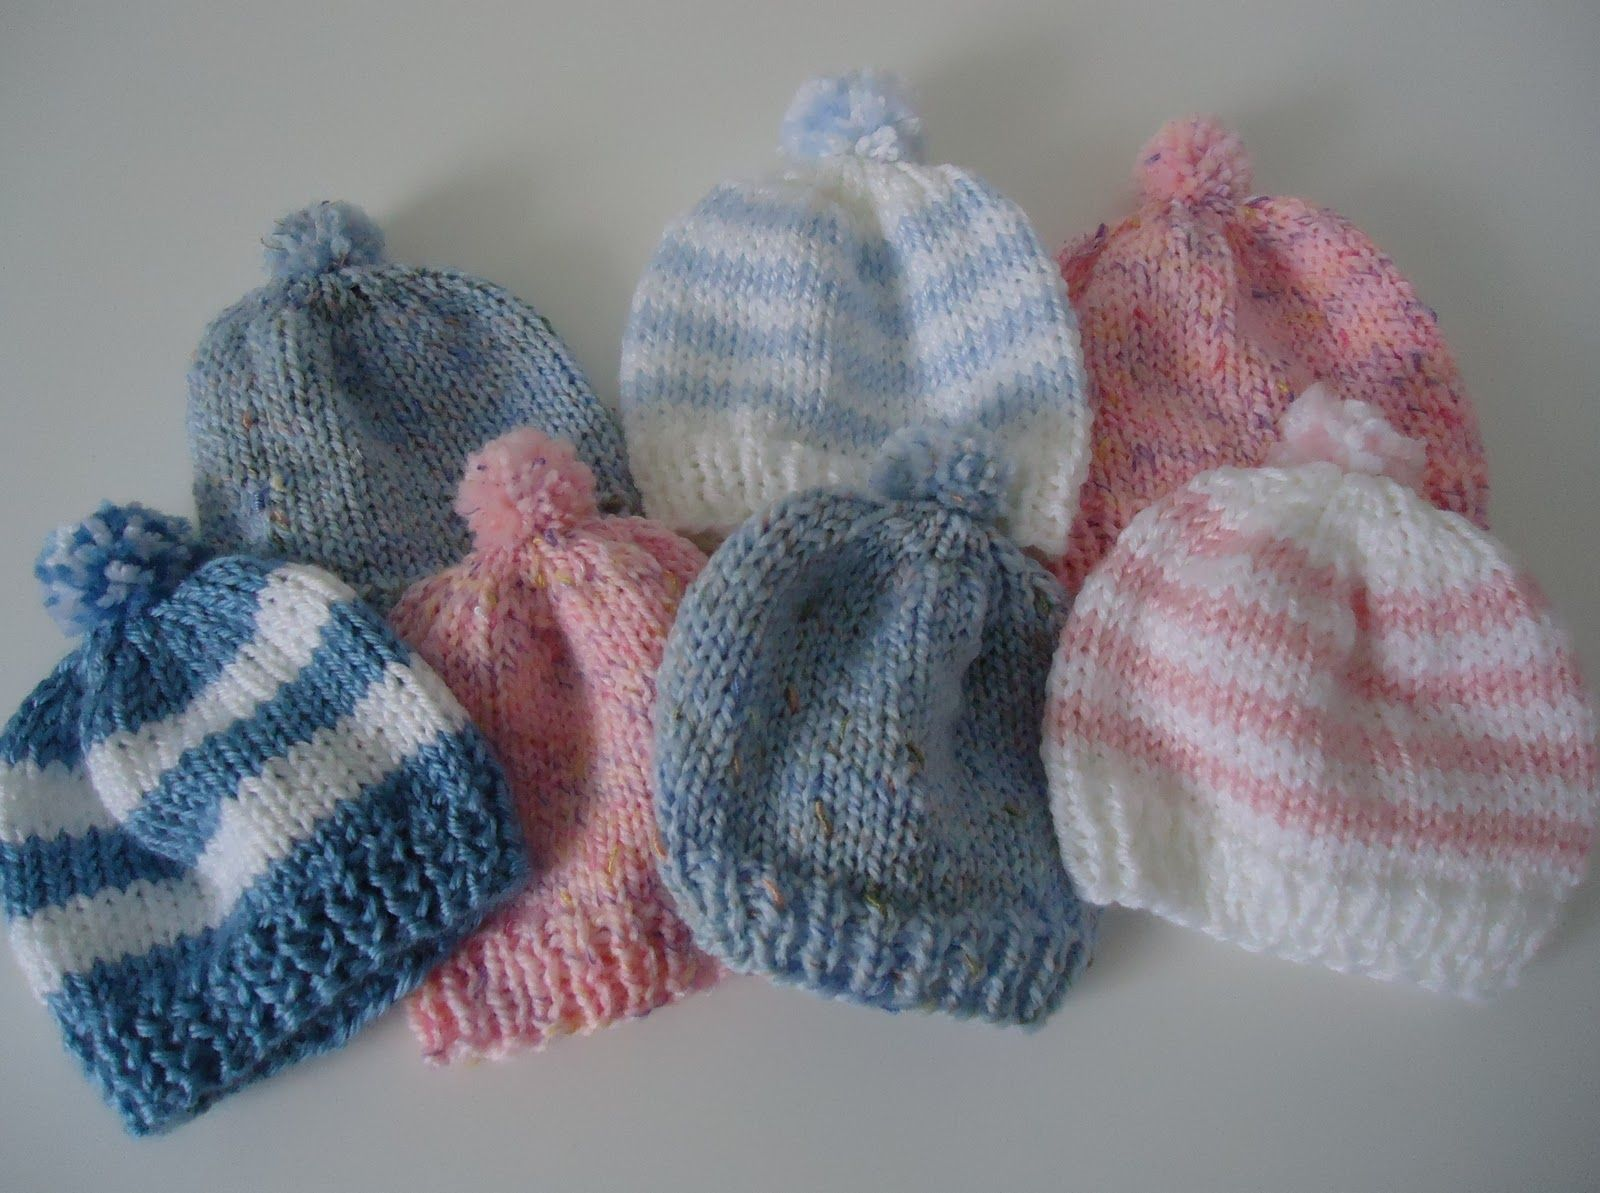 Knitting Newborn Hats For Hospitals Baby Hats Knitting Baby